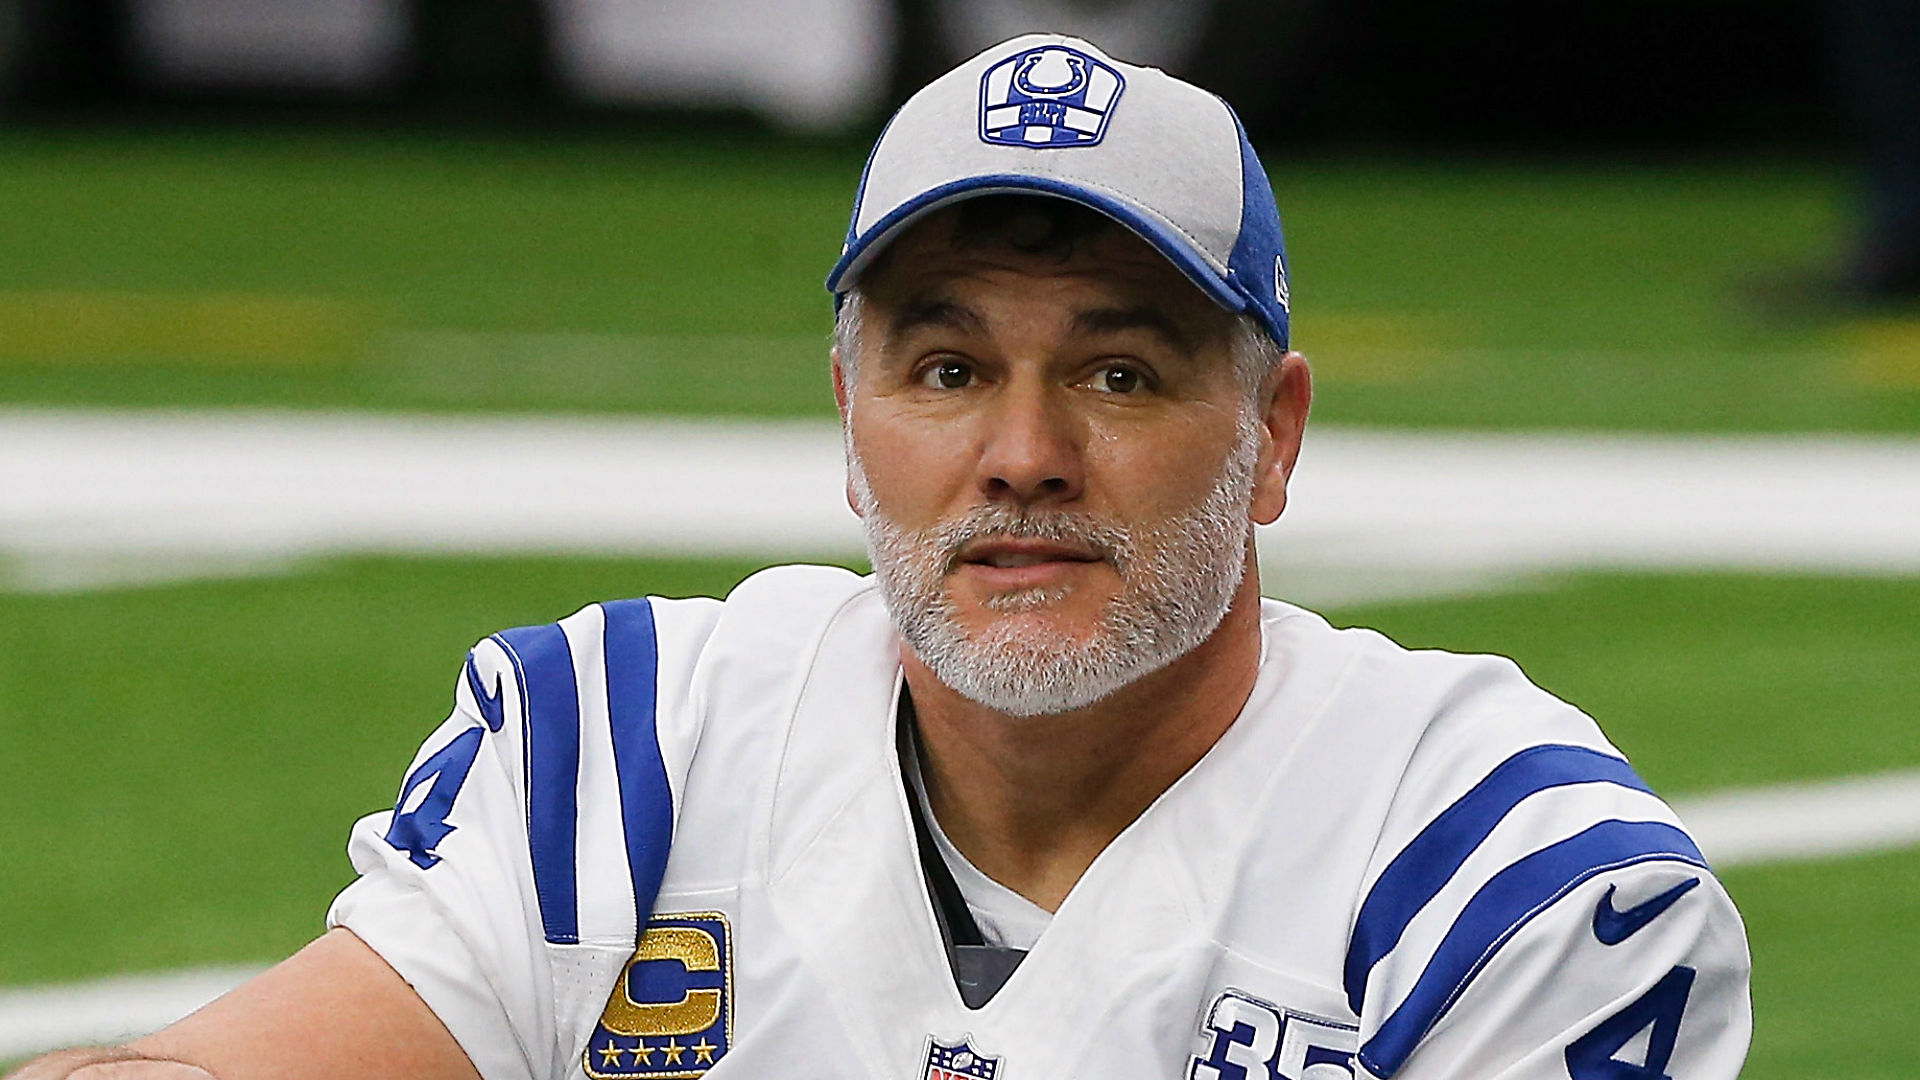 Colts' Adam Vinatieri will kick in Week